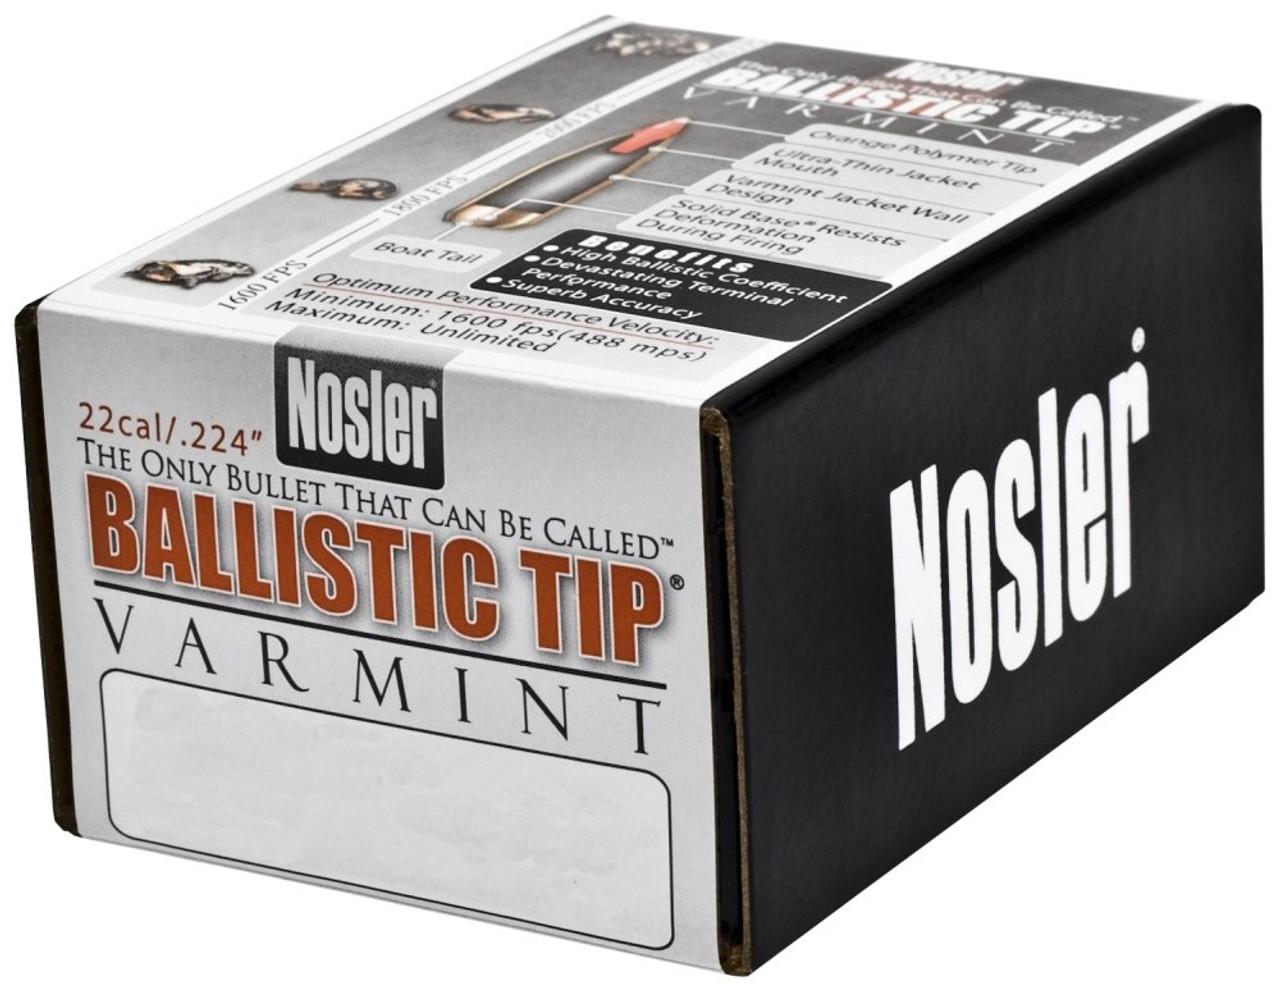 Nosler 39510 Ballistic Tip Varmint 22 Caliber .224 40 GR